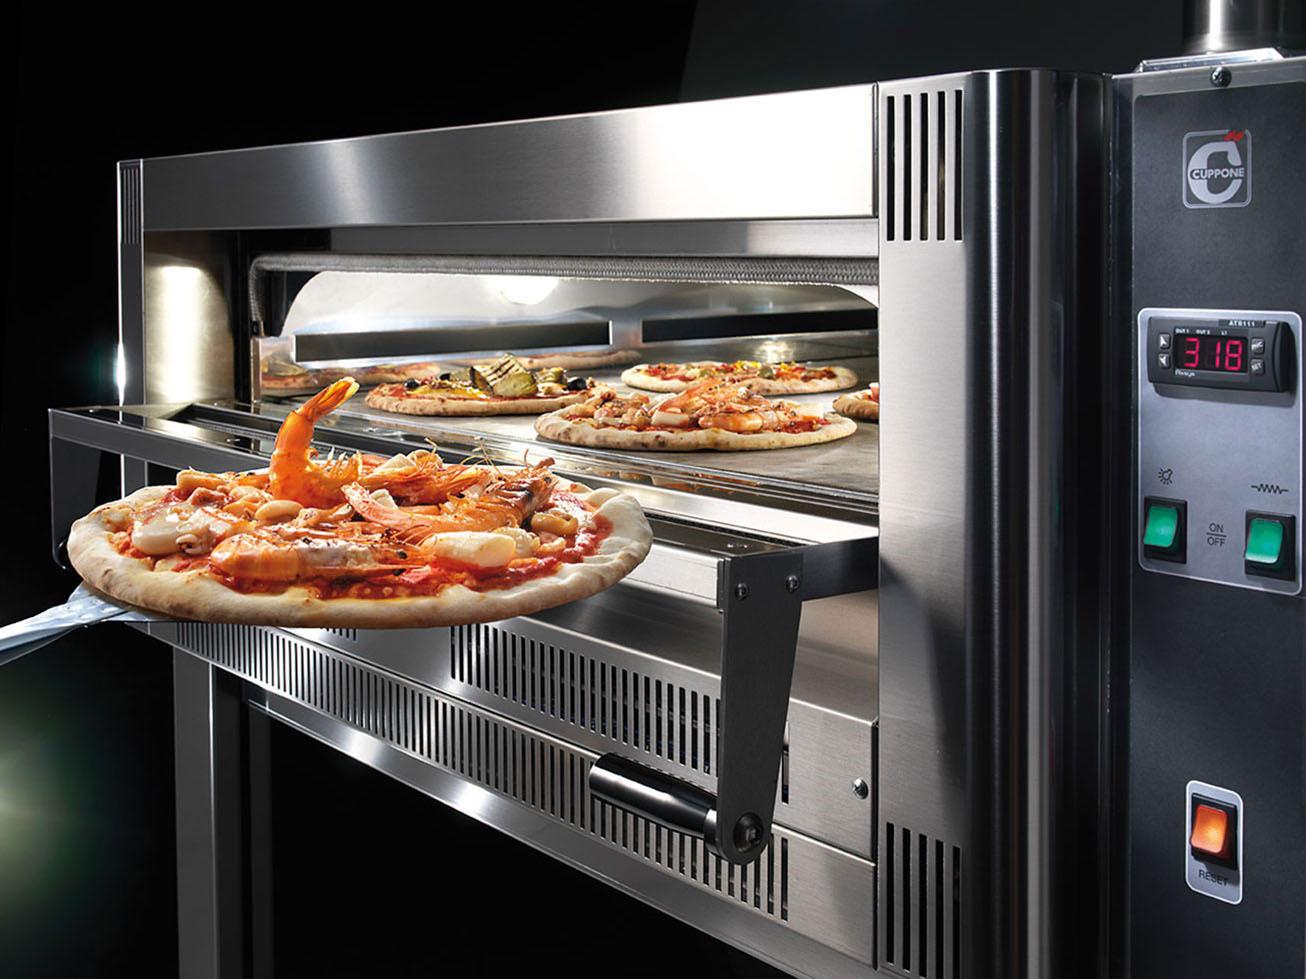 cuppone gas pizza oven llk5g euro pizza ovens. Black Bedroom Furniture Sets. Home Design Ideas